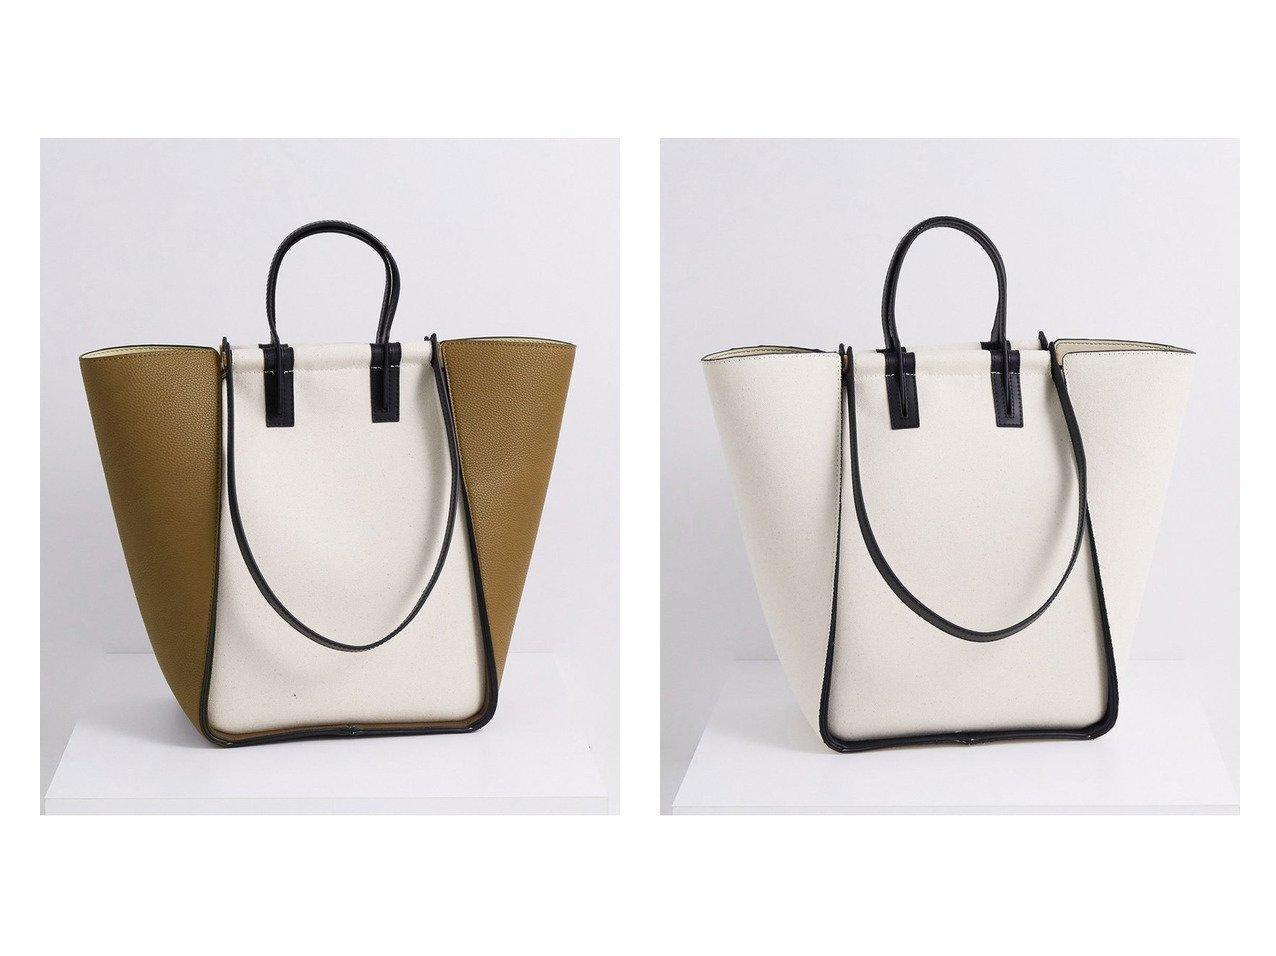 【E'POR/ロペ エポール】の【E POR】BUTTERFLY A4トート バッグ・鞄のおすすめ!人気、トレンド・レディースファッションの通販 おすすめで人気の流行・トレンド、ファッションの通販商品 メンズファッション・キッズファッション・インテリア・家具・レディースファッション・服の通販 founy(ファニー) https://founy.com/ ファッション Fashion レディースファッション WOMEN バッグ Bag コンビ シンプル フォルム ベーシック ポケット |ID:crp329100000013698